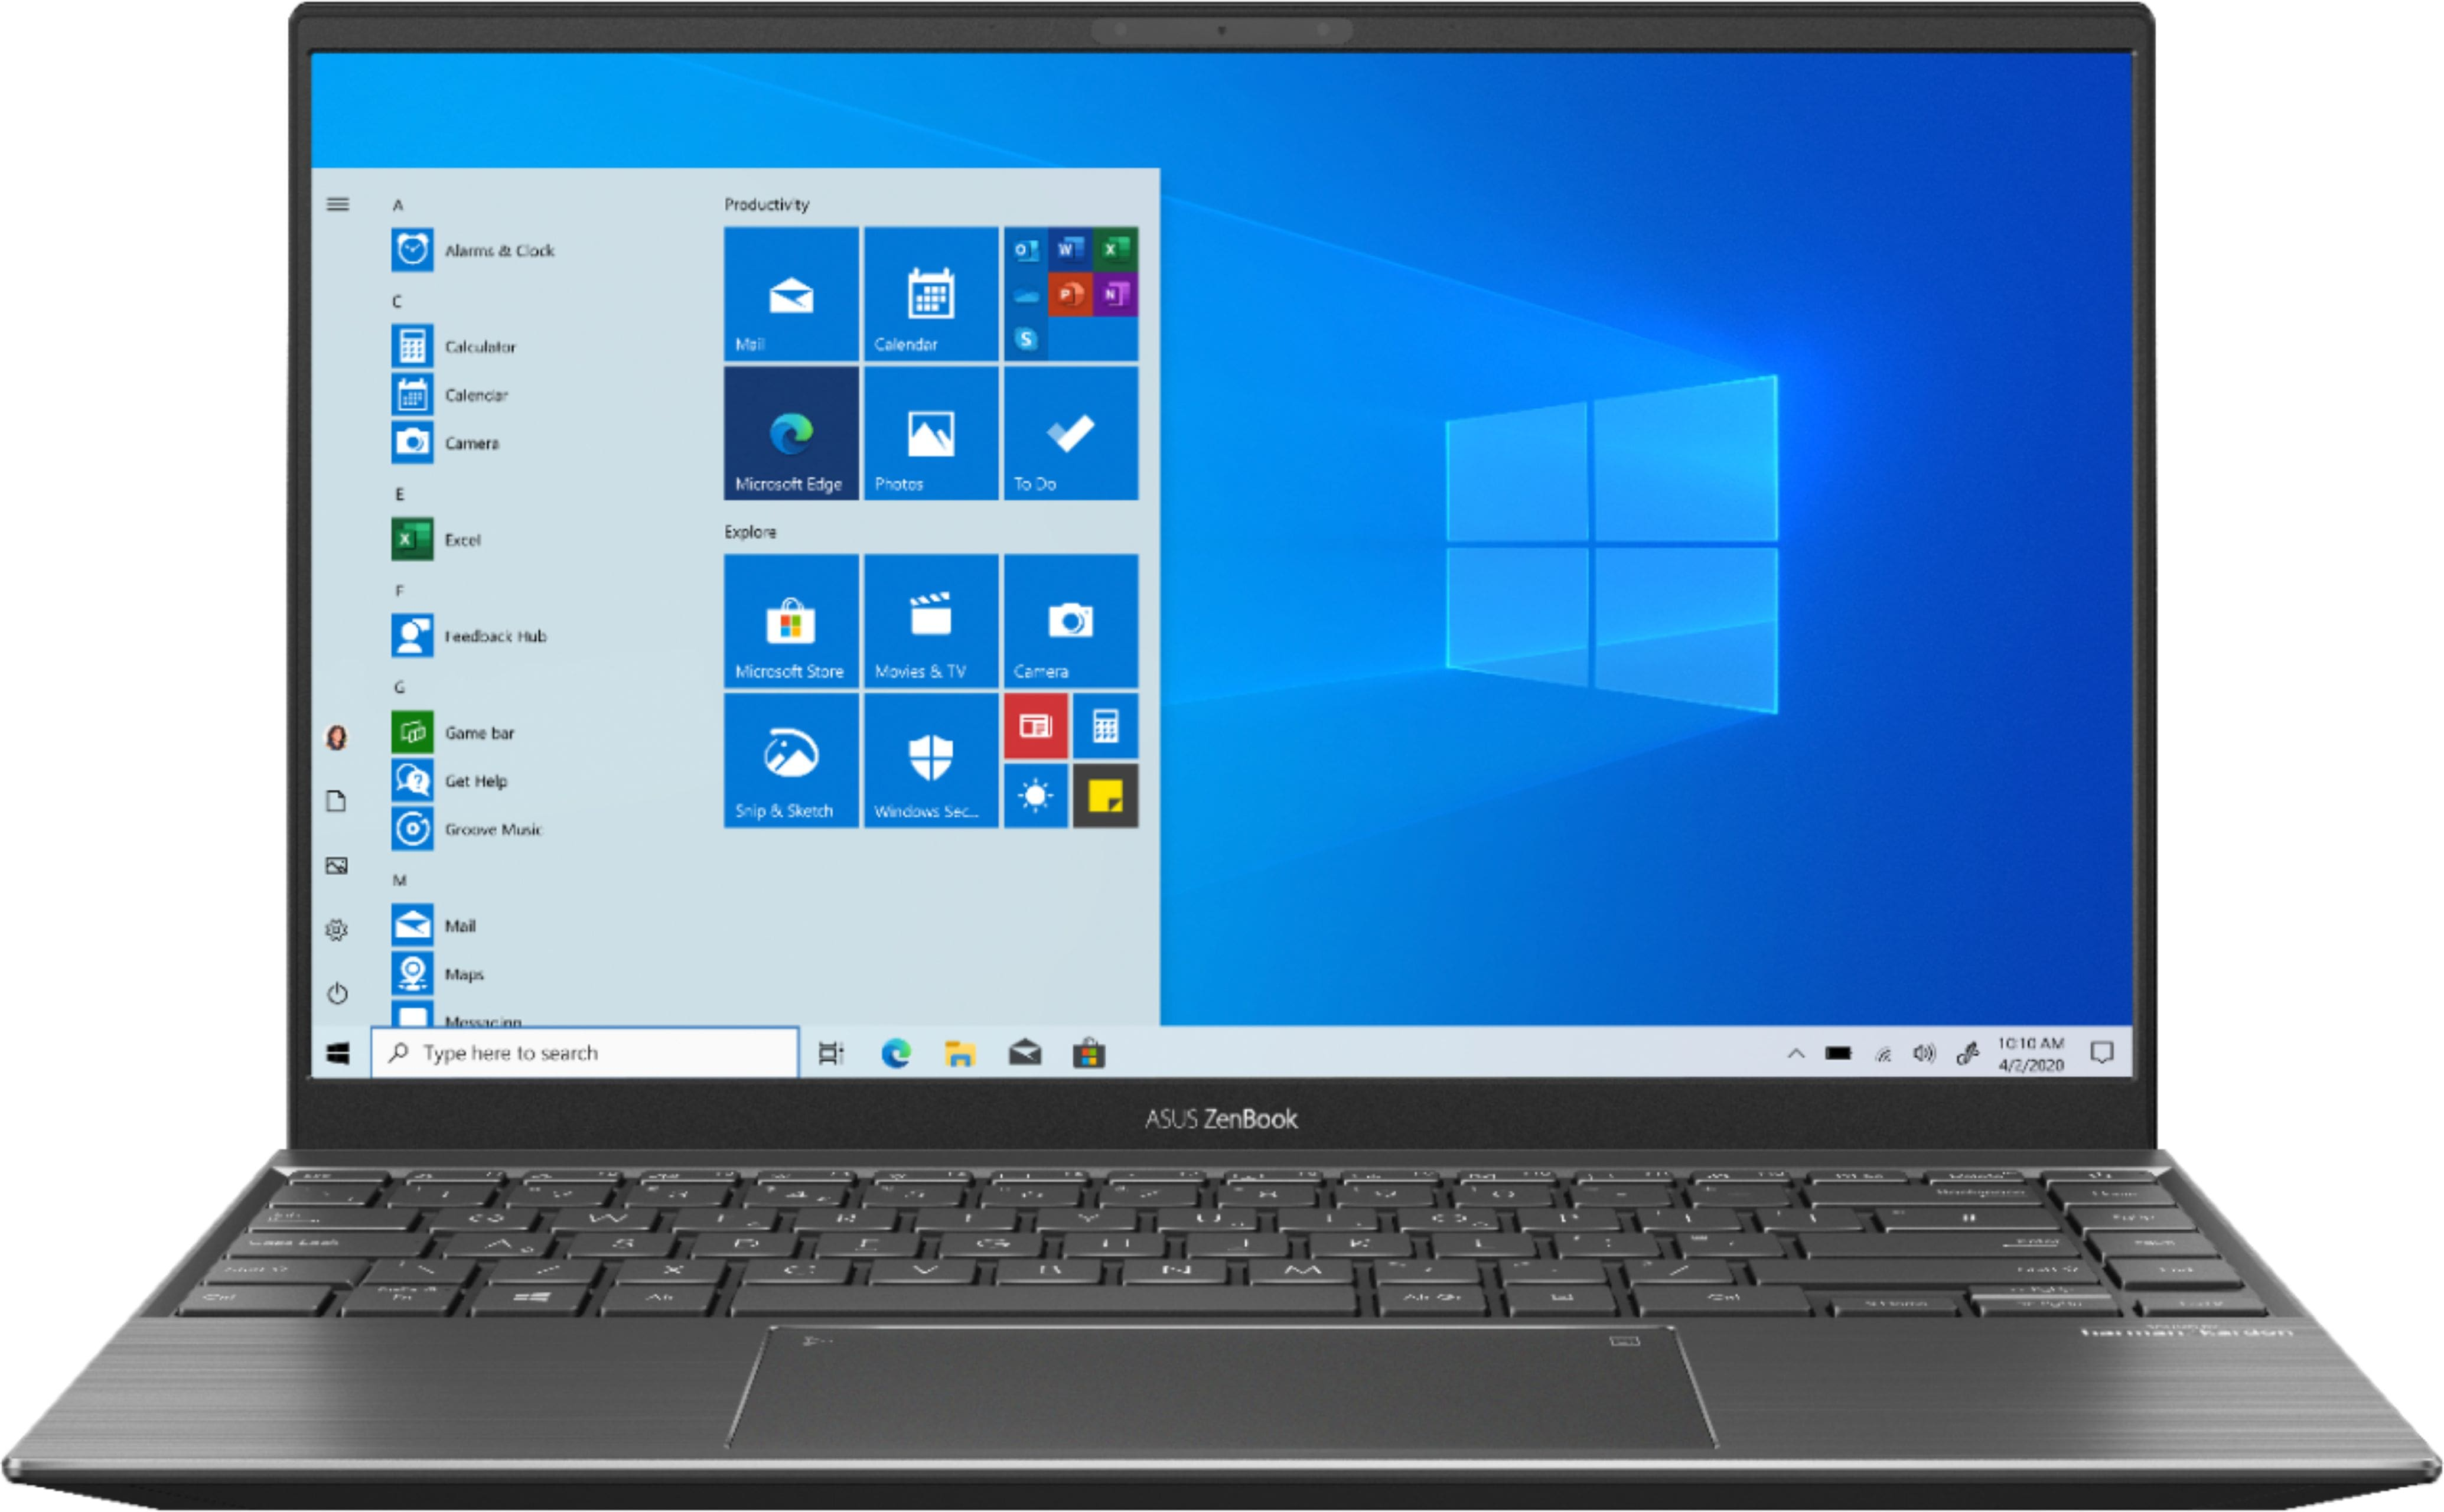 "ASUS Zenbook 14"" Laptop AMD Ryzen 5 8GB Memory NVIDIA GeForce MX450 256GB SSD Light Grey Q408UG-211.BL - Best Buy $569.99"